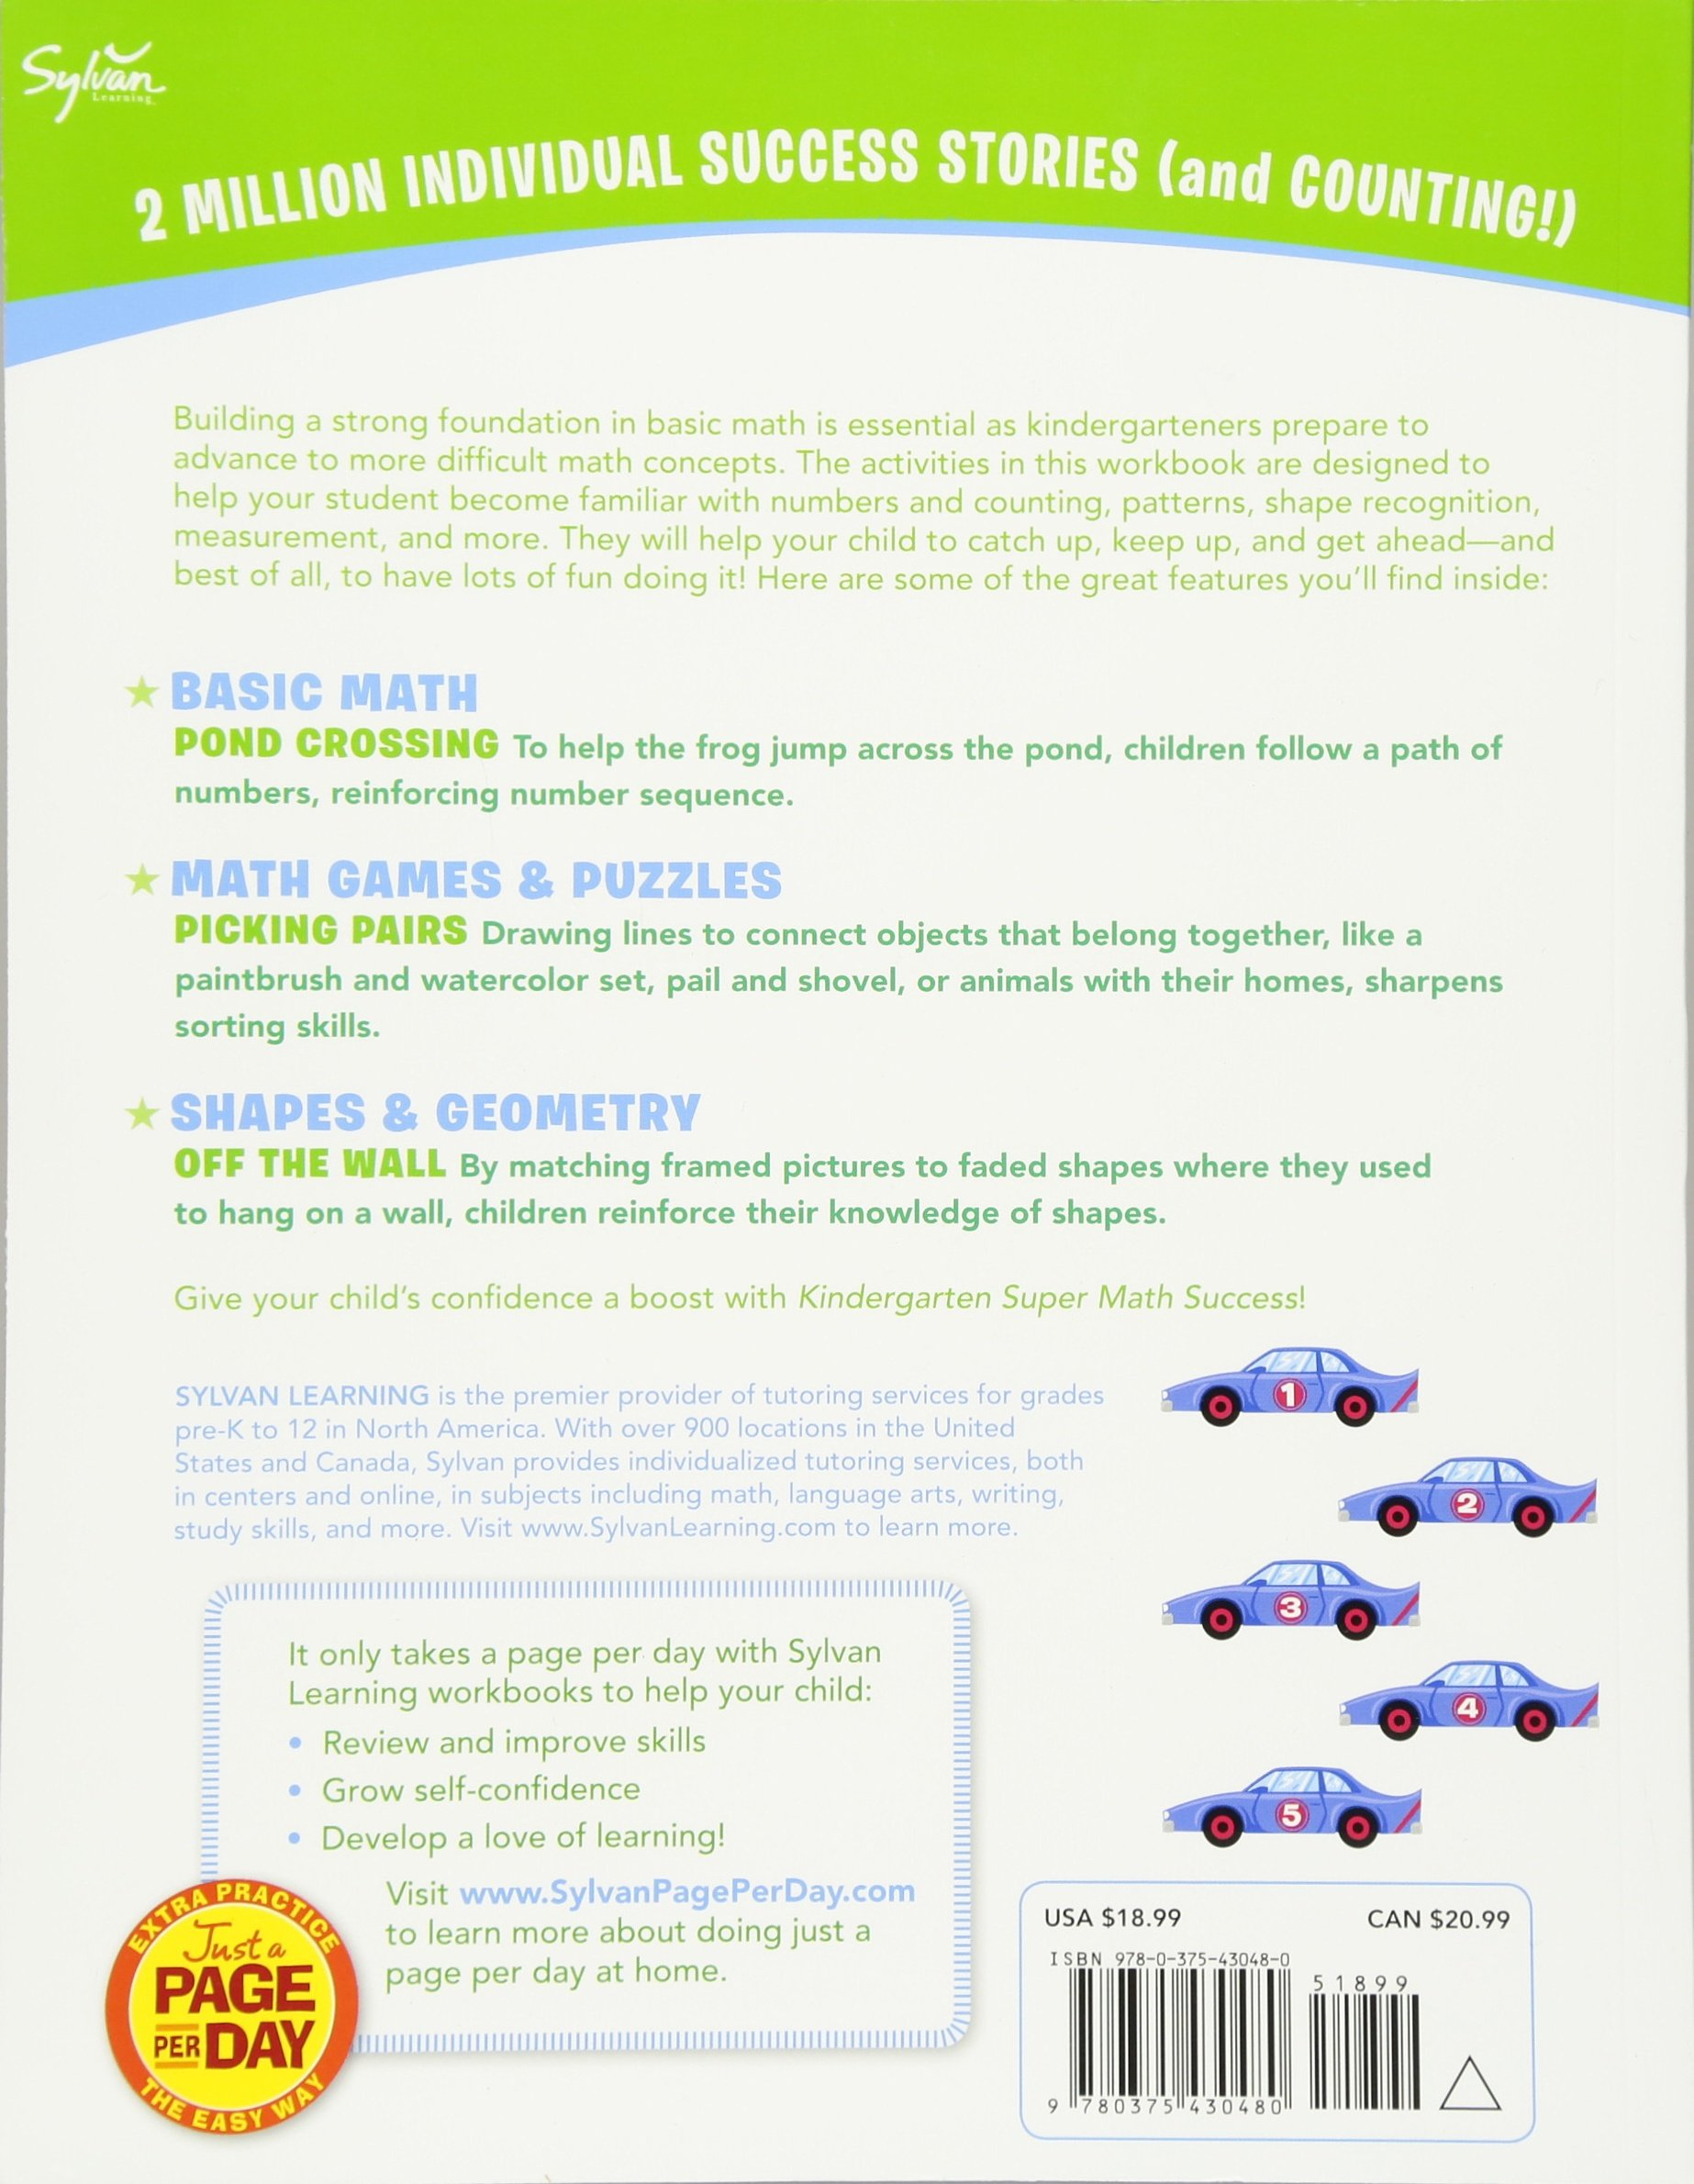 Kindergarten Super Math Success: Activities, Exercises, and Tips to ...